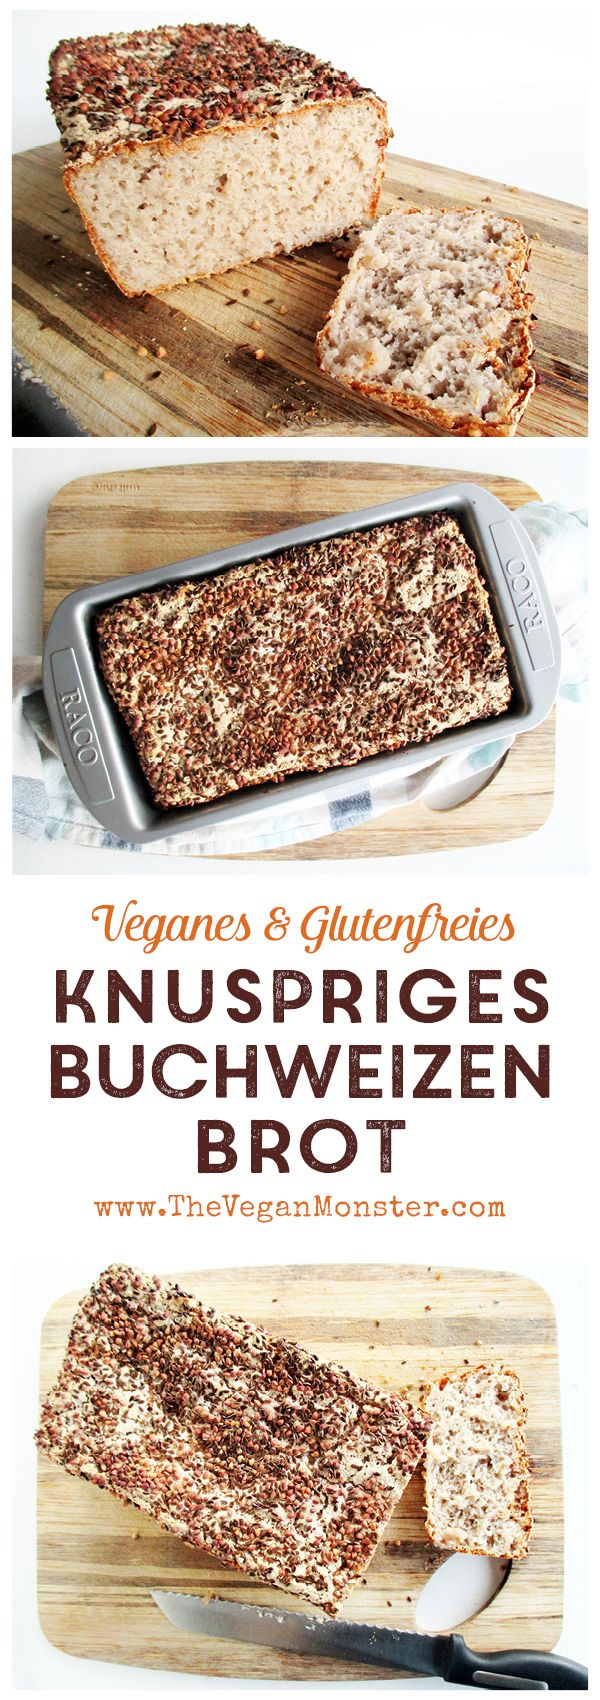 FODMAP-armes Rezept für knuspriges Buchweizen Brot. Glutenfrei, laktosefrei, fr…